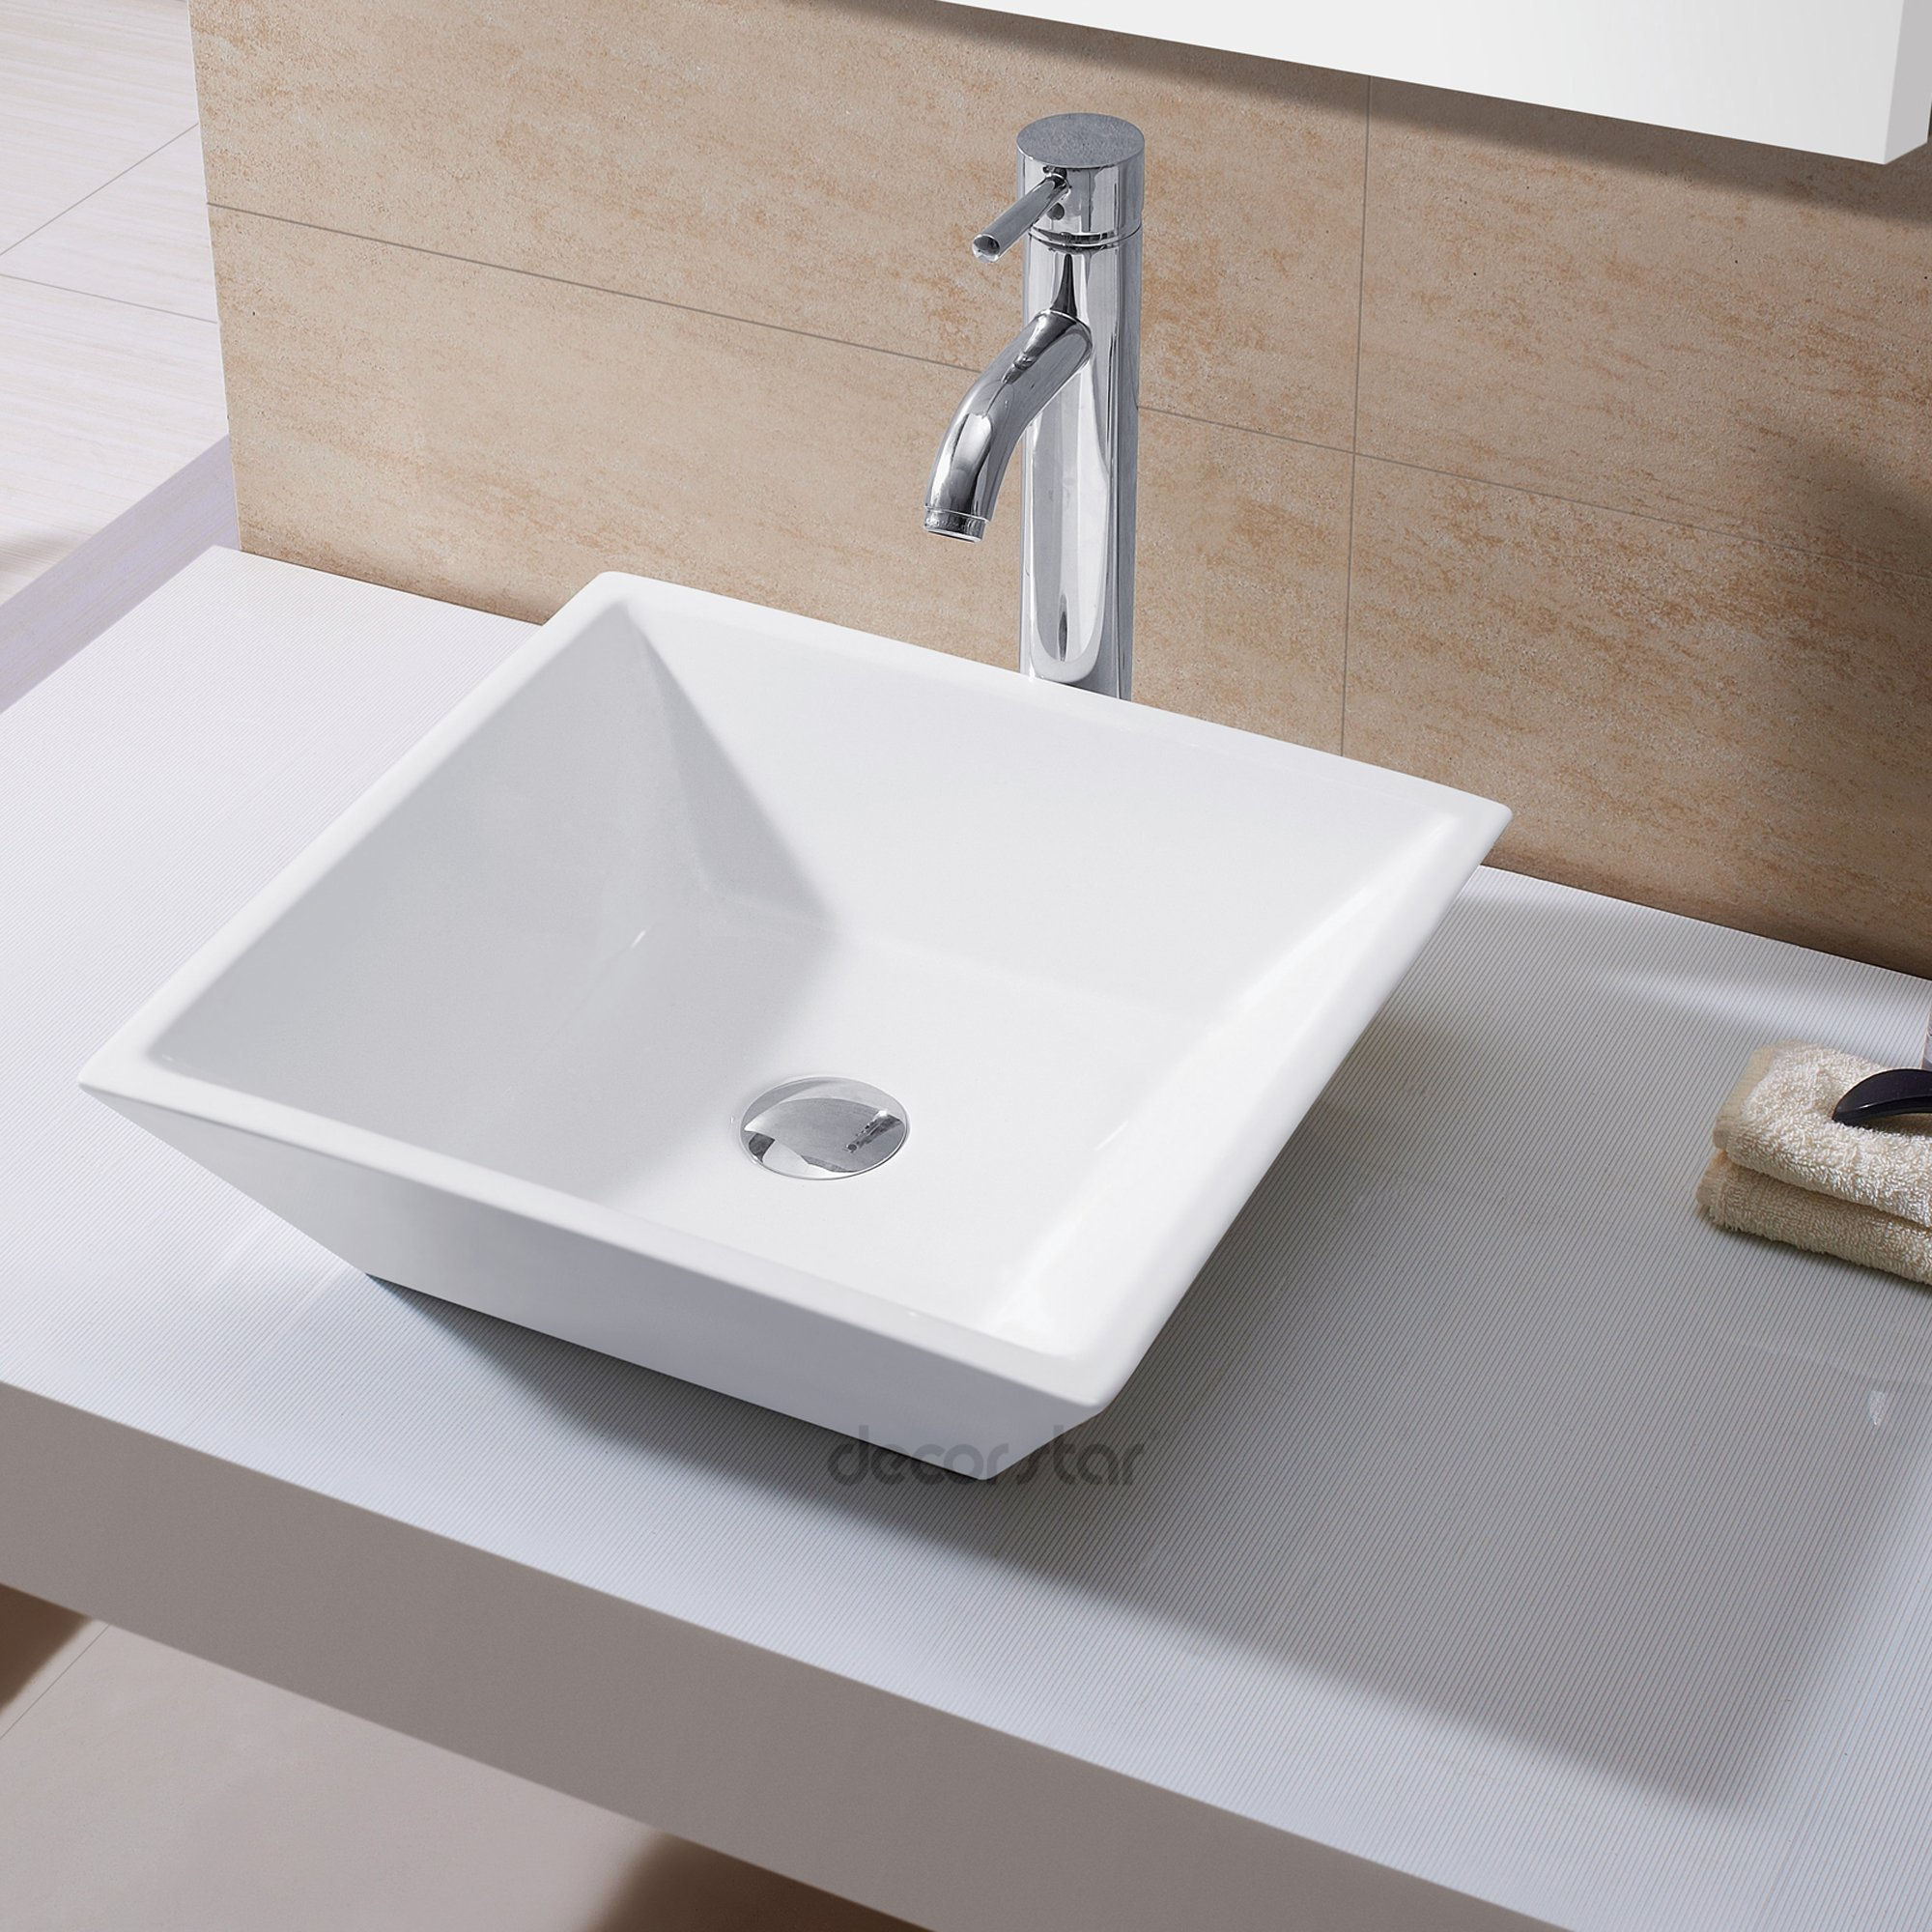 Decor Star CB-006 Bathroom Porcelain Ceramic Vessel Vanity Sink Art Basin